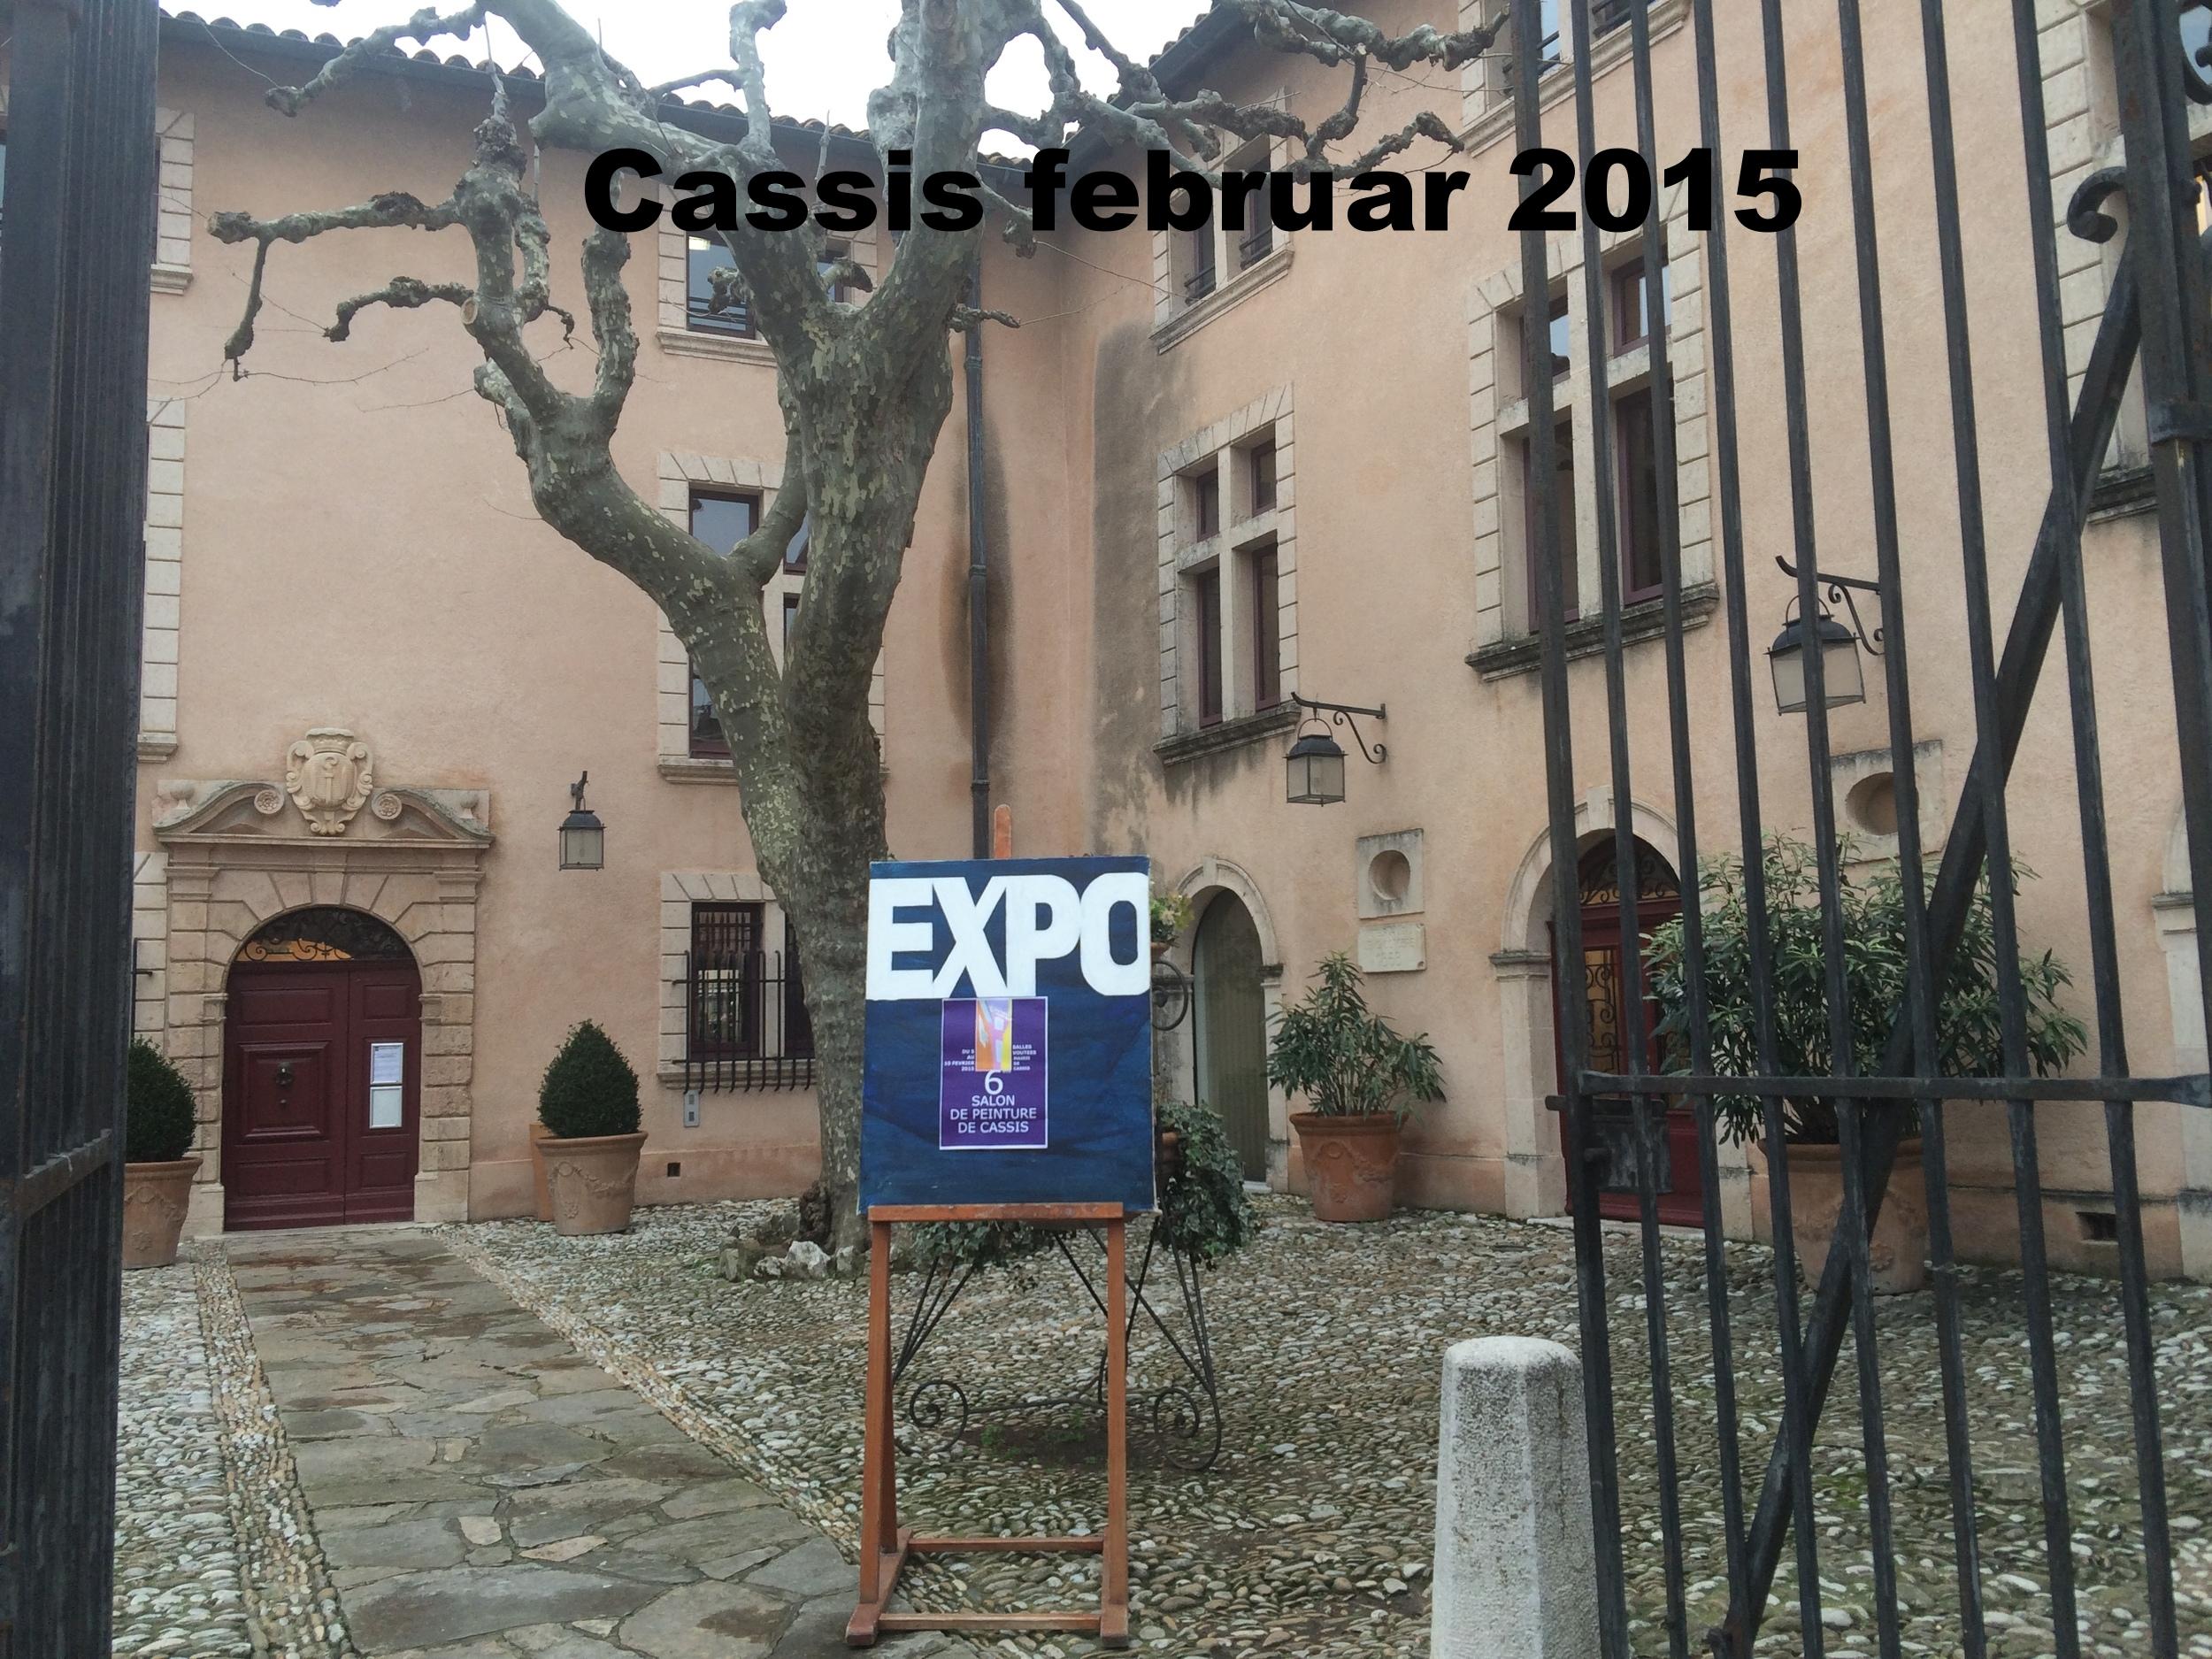 Cassis 2014